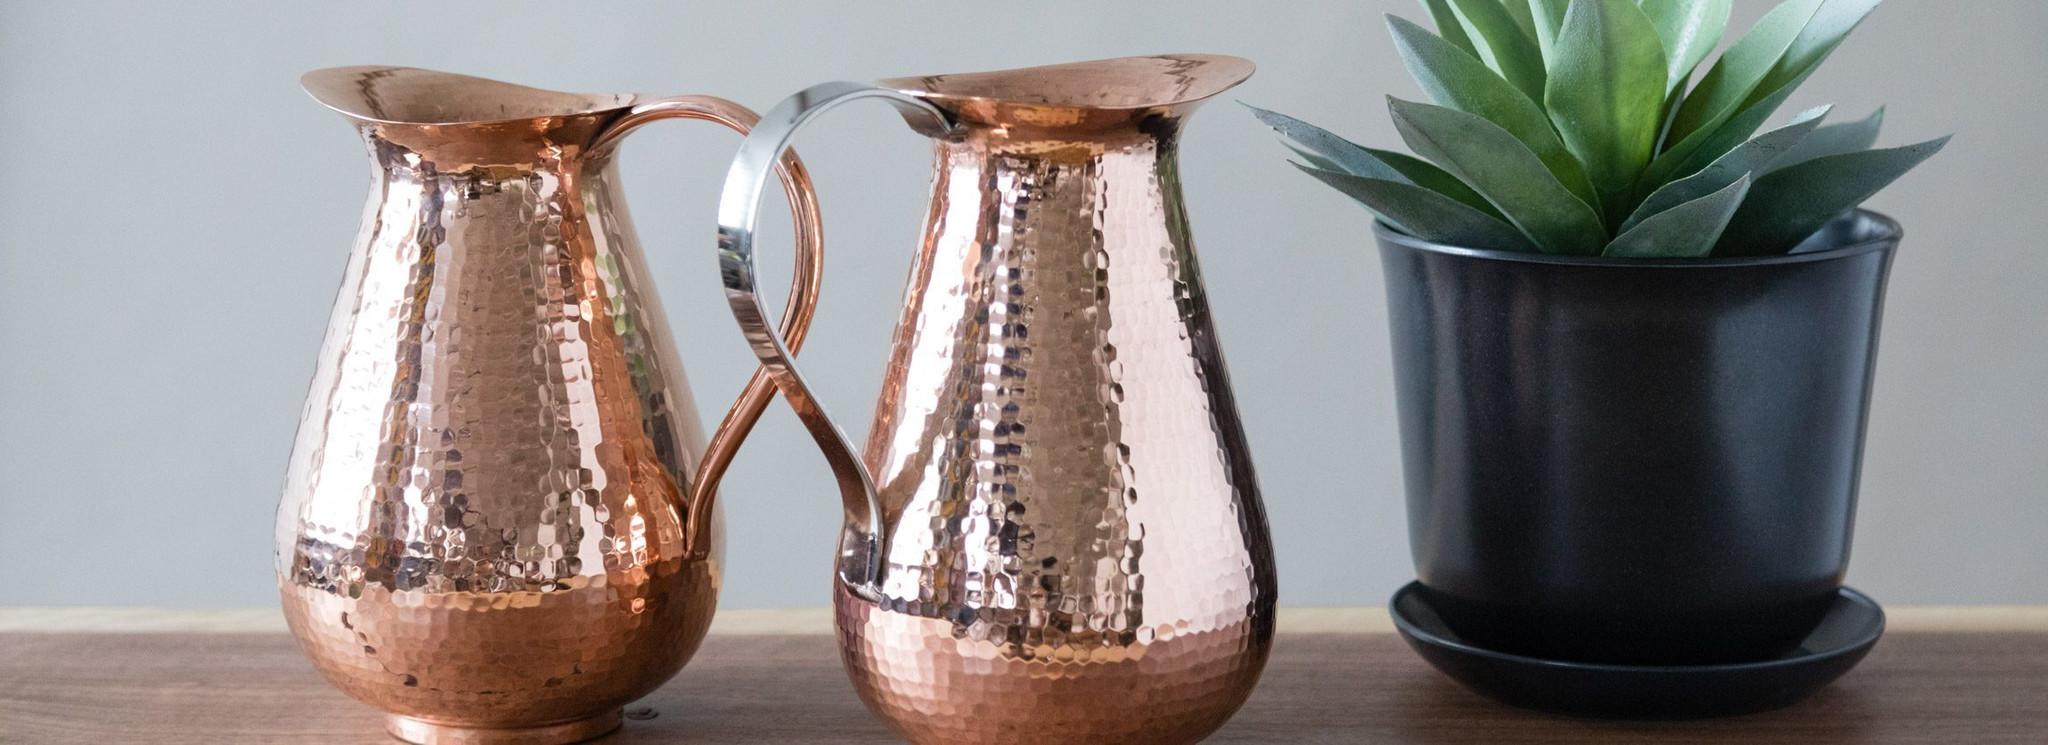 Handmade Copper Water Pitchers